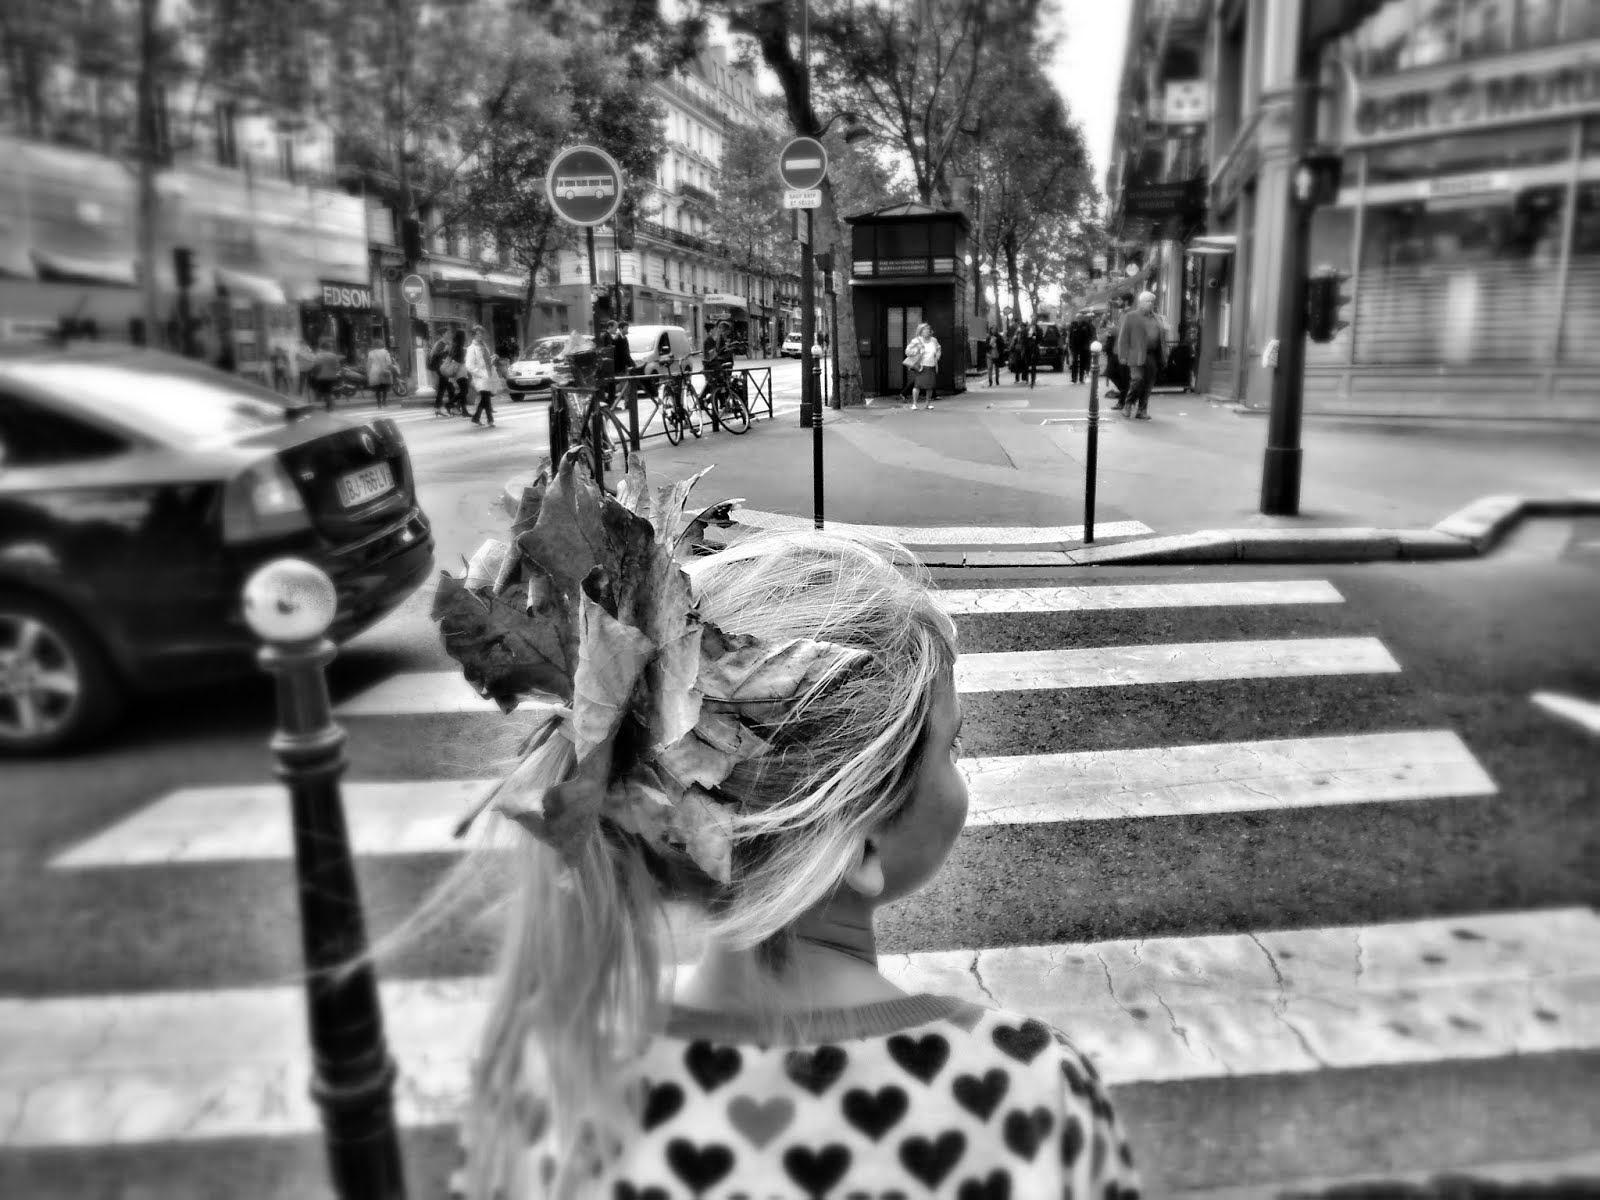 Fotografi fra Paris